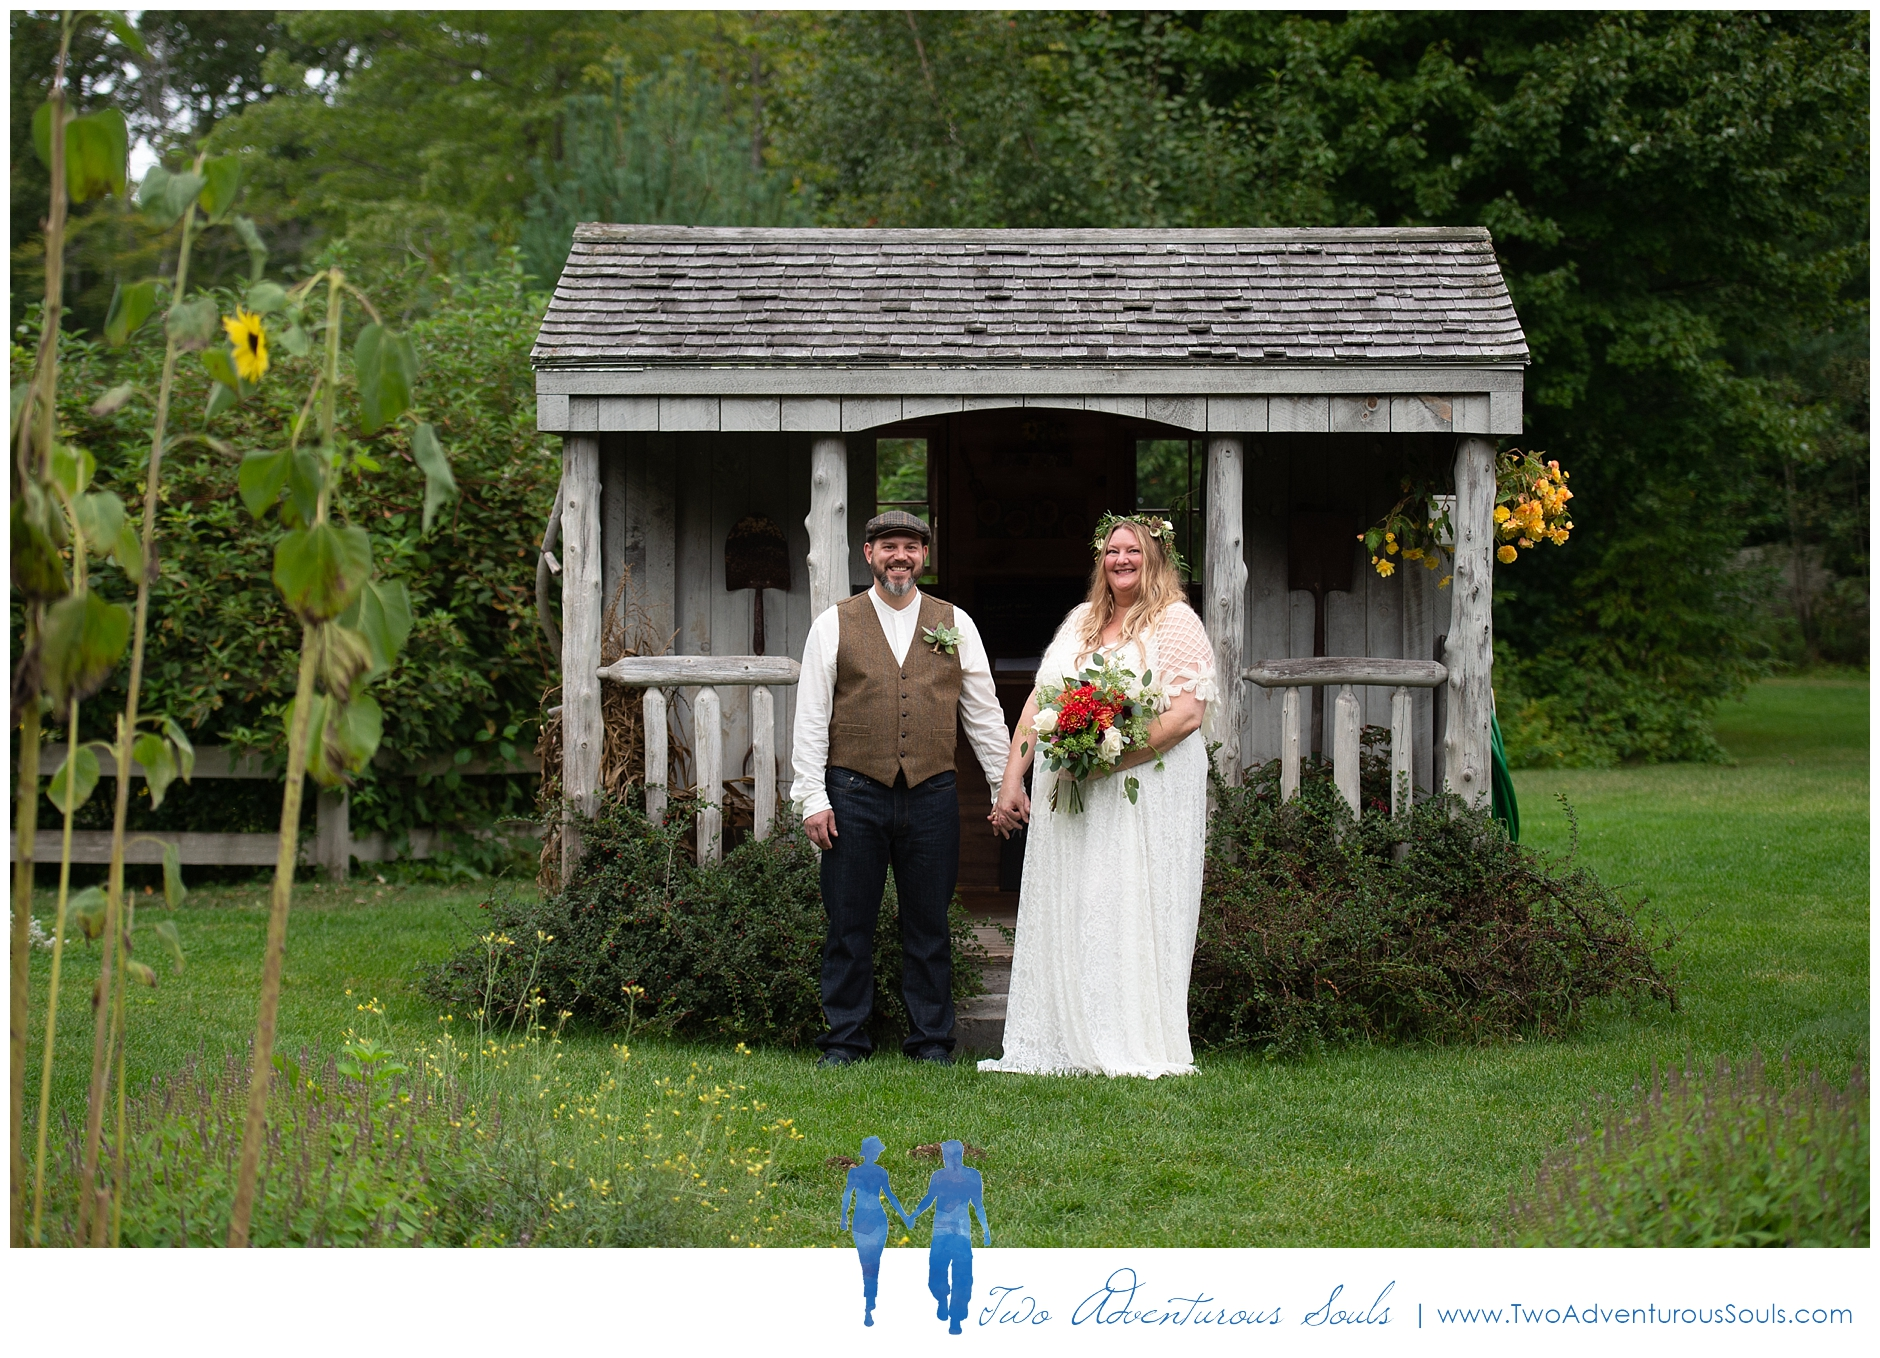 091218 - Chad & Kimmi - sneaks-34_Hidden Pond Wedding, Earth at Hidden Pond, Kennebunkport Wedding.jpg